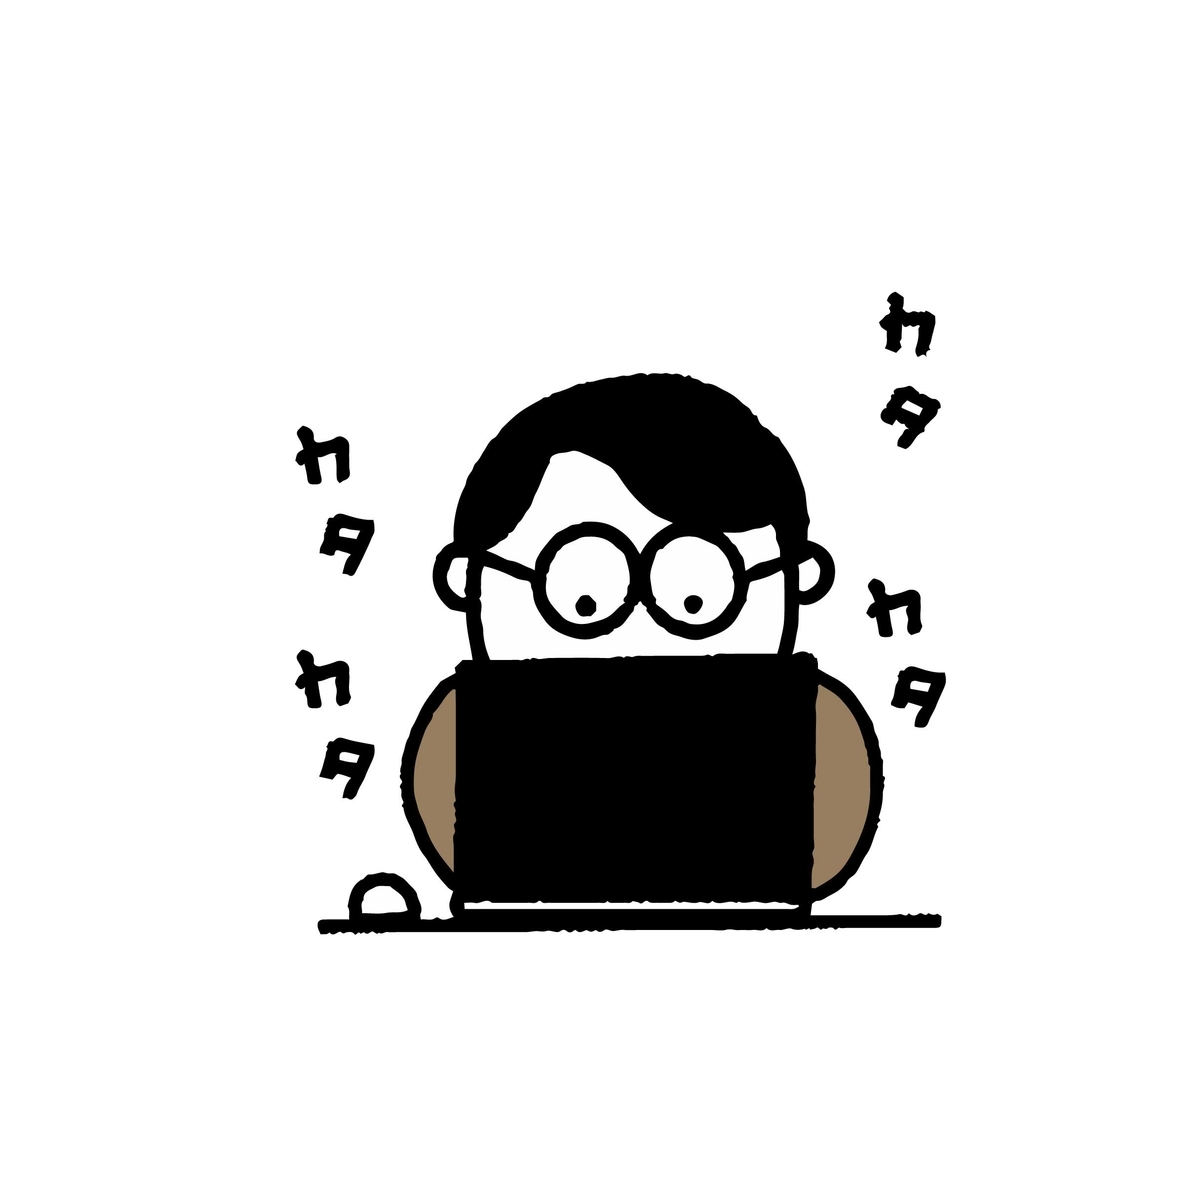 f:id:I_am_an_easy_going:20210514104622j:plain